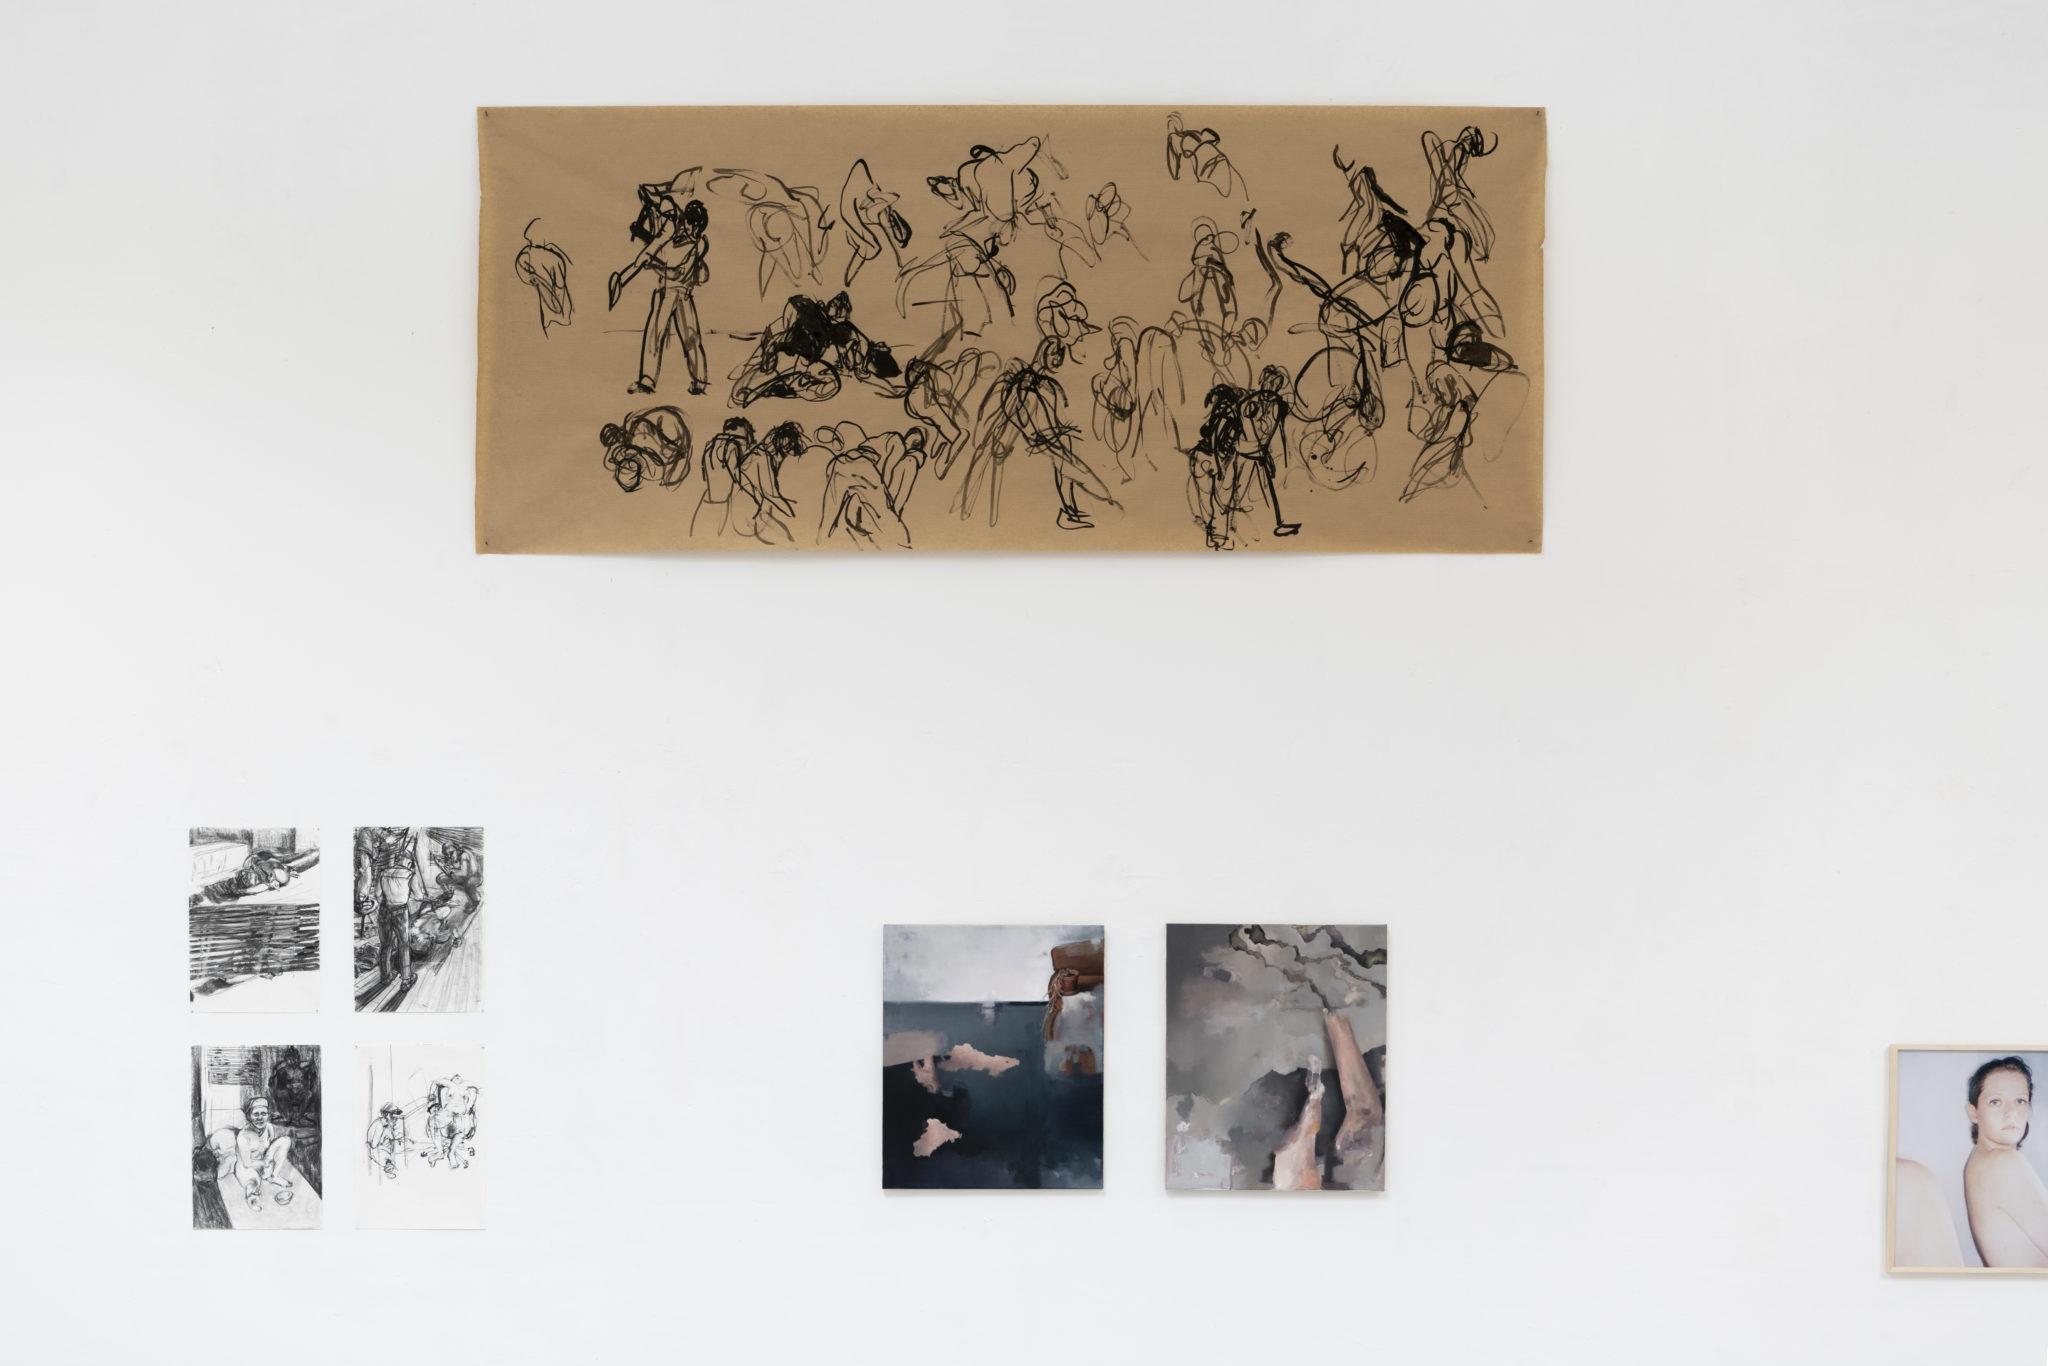 Franziska_Koch_Contact_Improvisation_Tusche_auf_Papier_100x240cm_2020